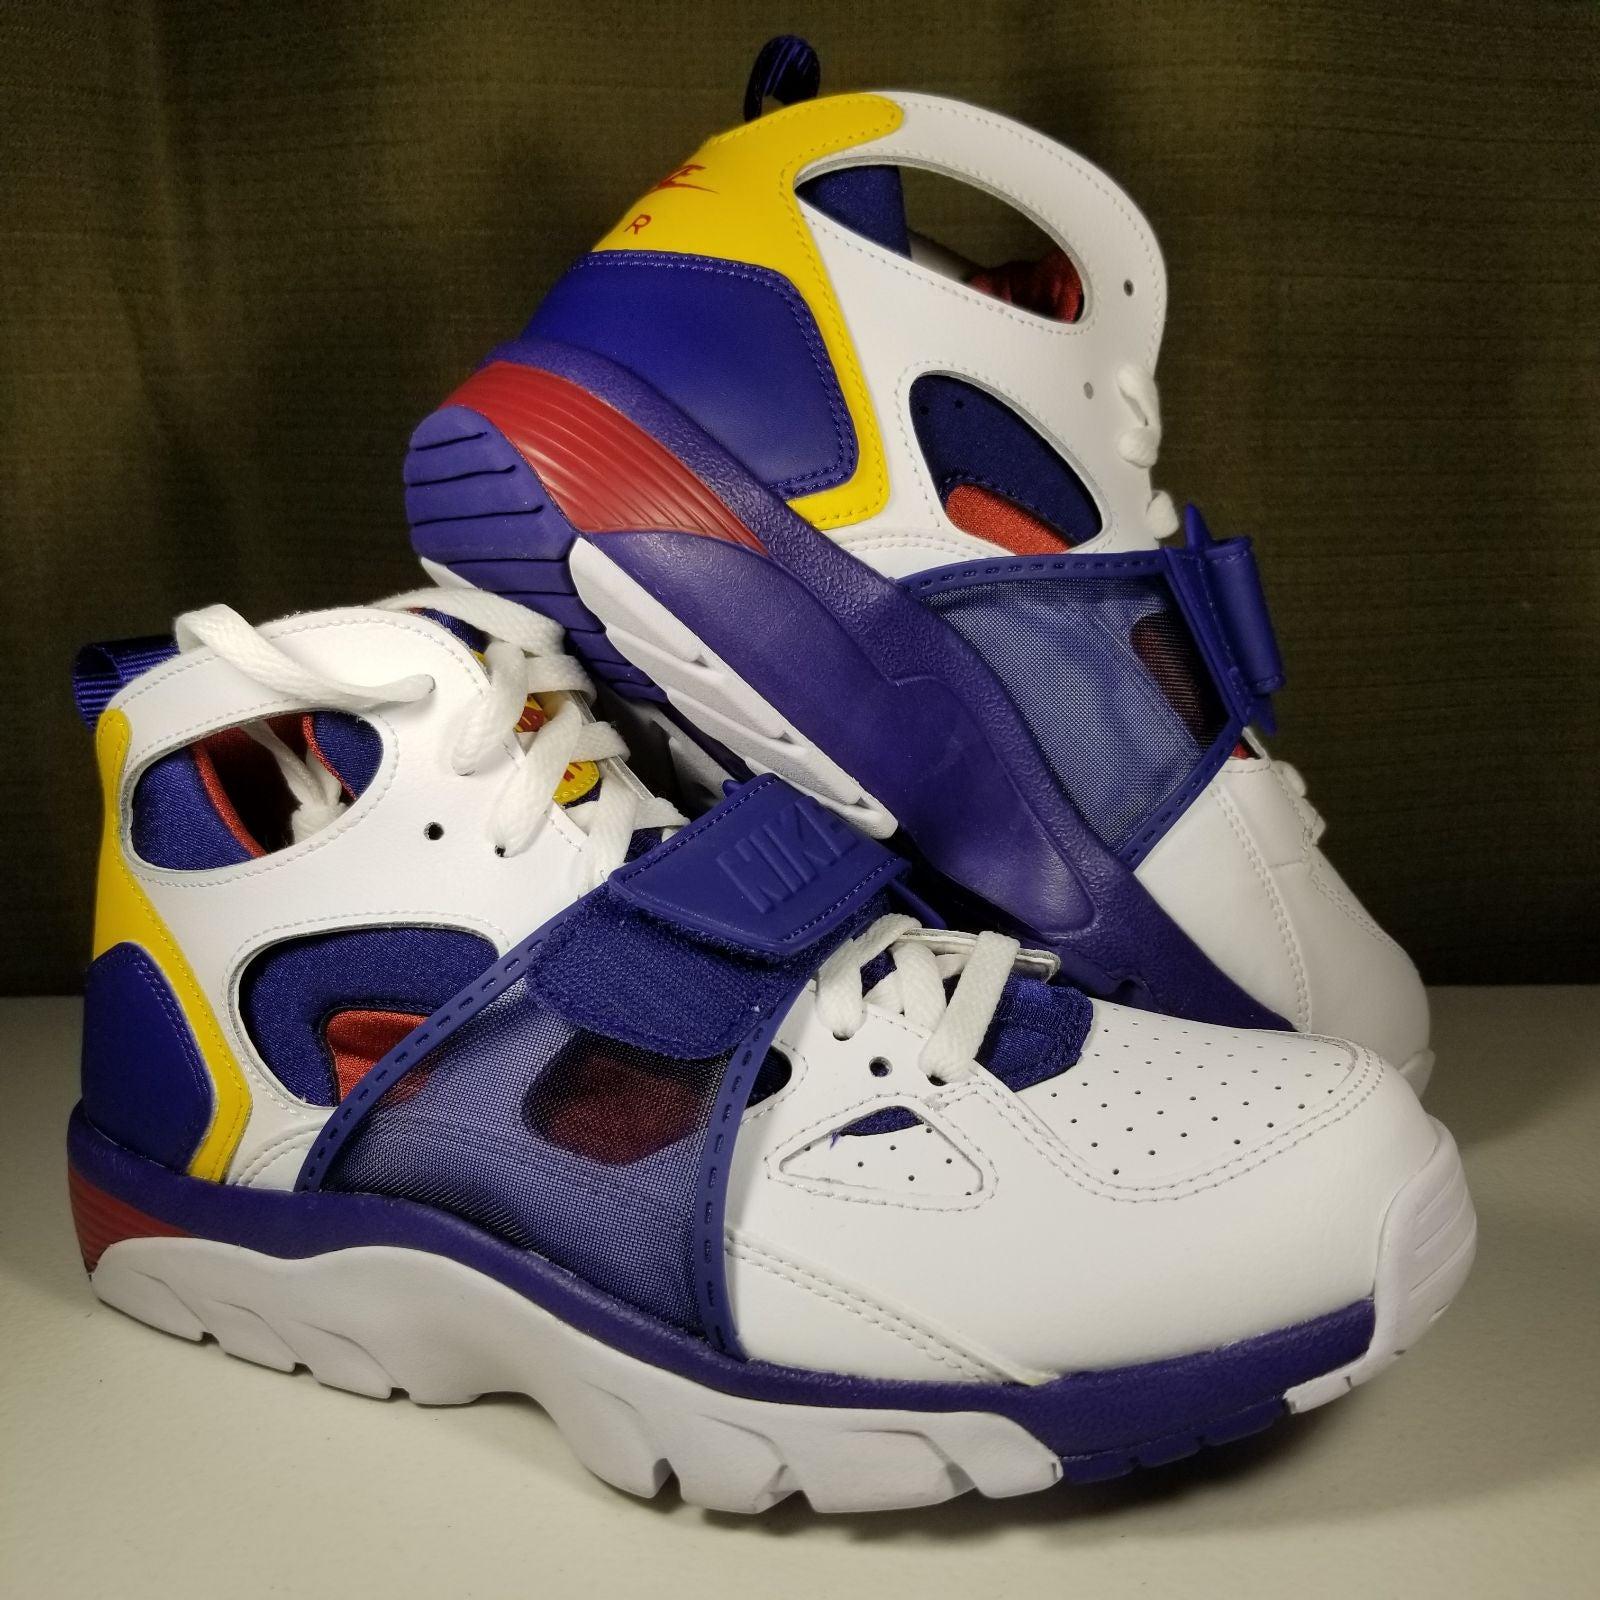 Nike Men's Air Trainer Huarache Sneakers